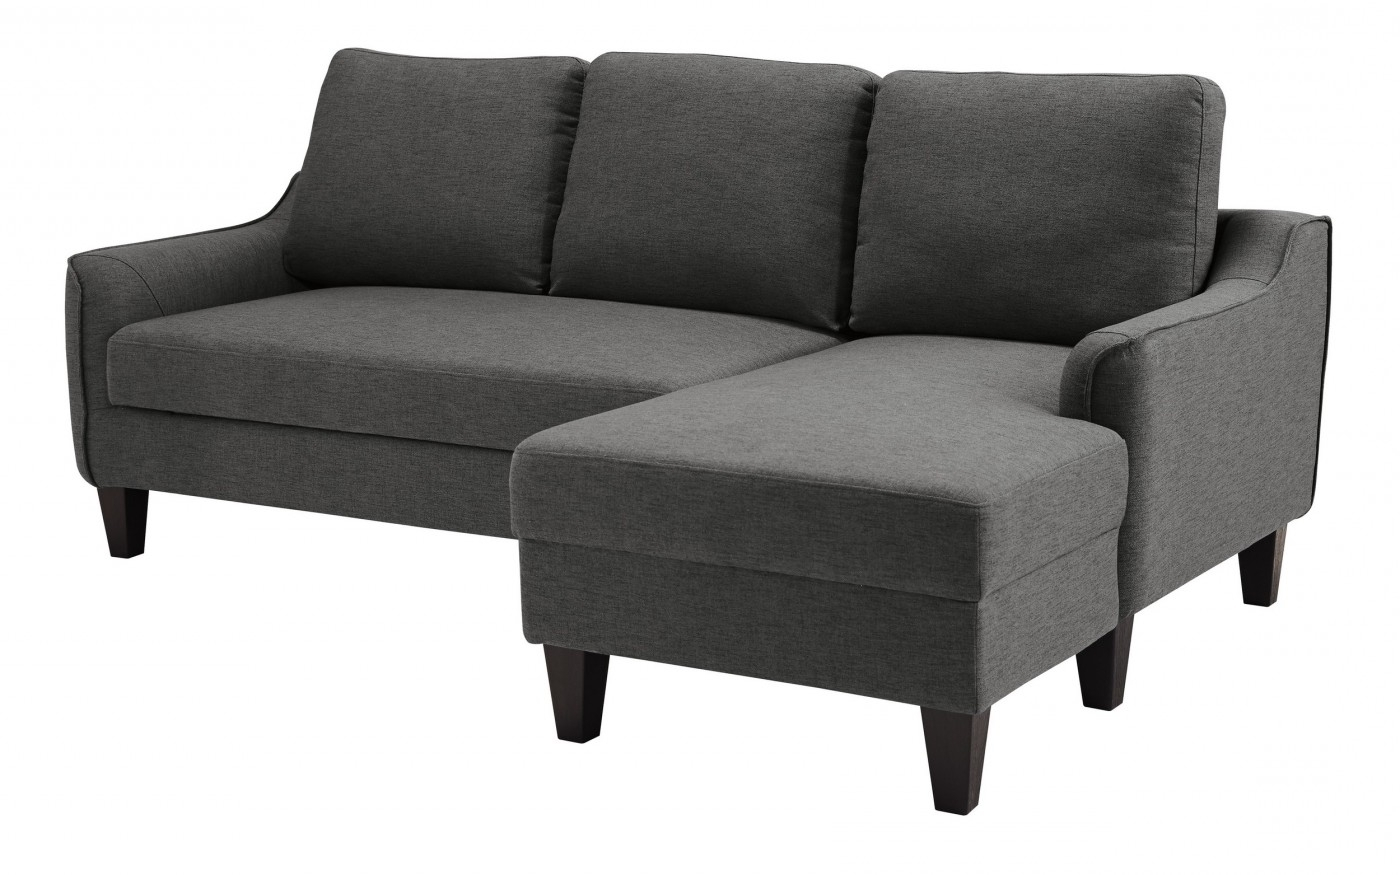 Signature Designashley Jarreau Gray Sofa Chaise Sleeper With Most Popular Sofa Chaise Sleepers (View 8 of 15)